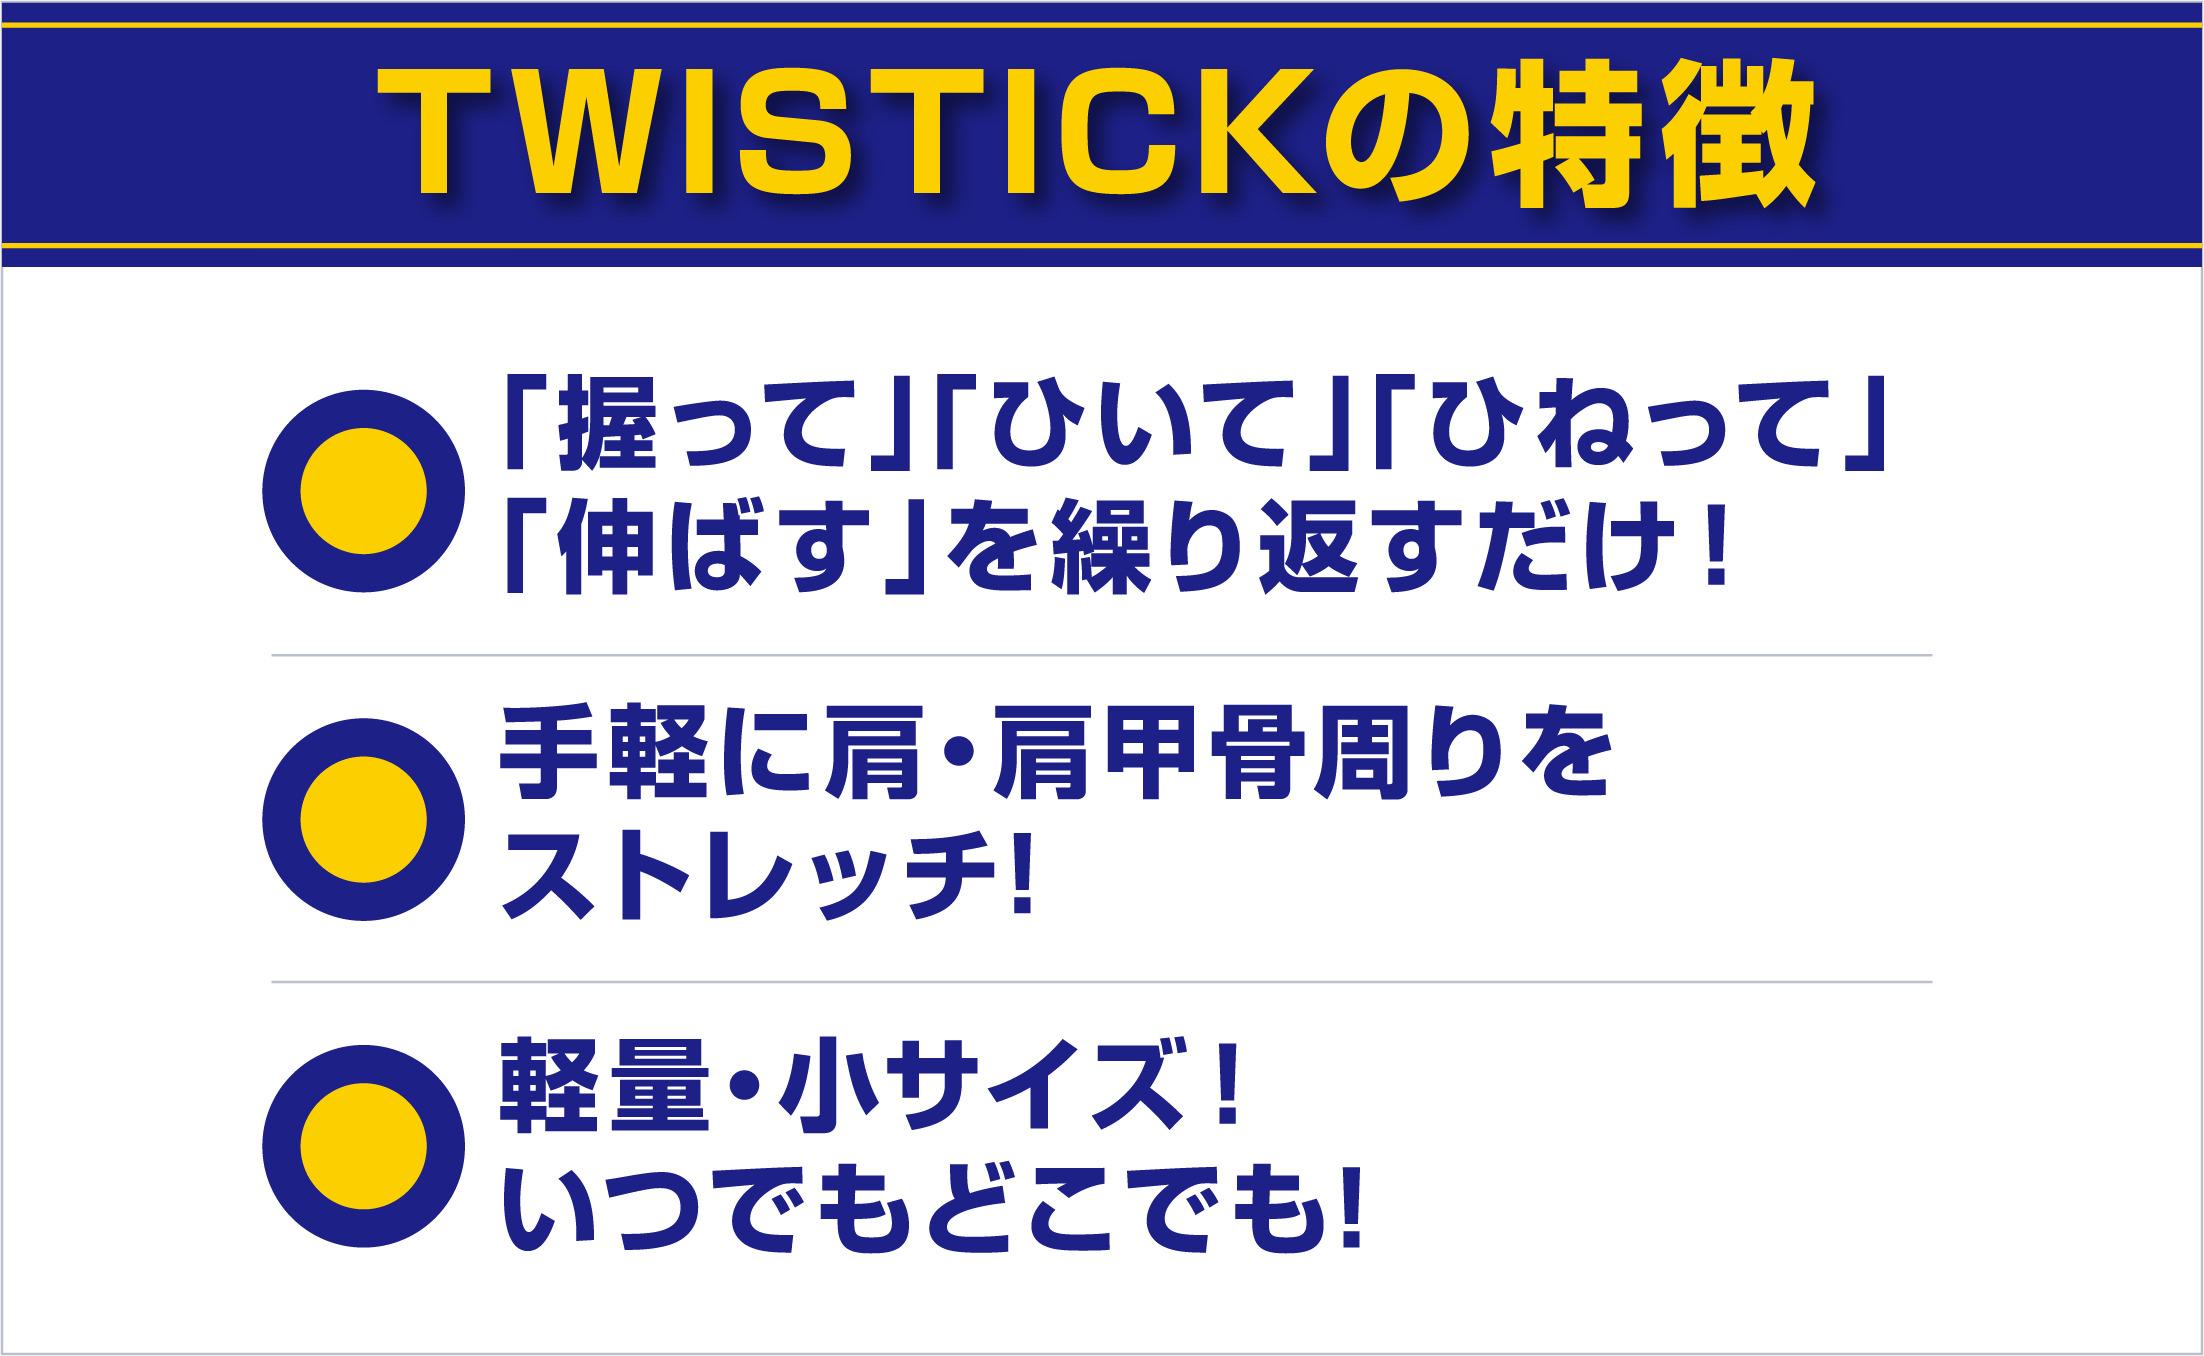 TWISTICKの詳細説明イメージ